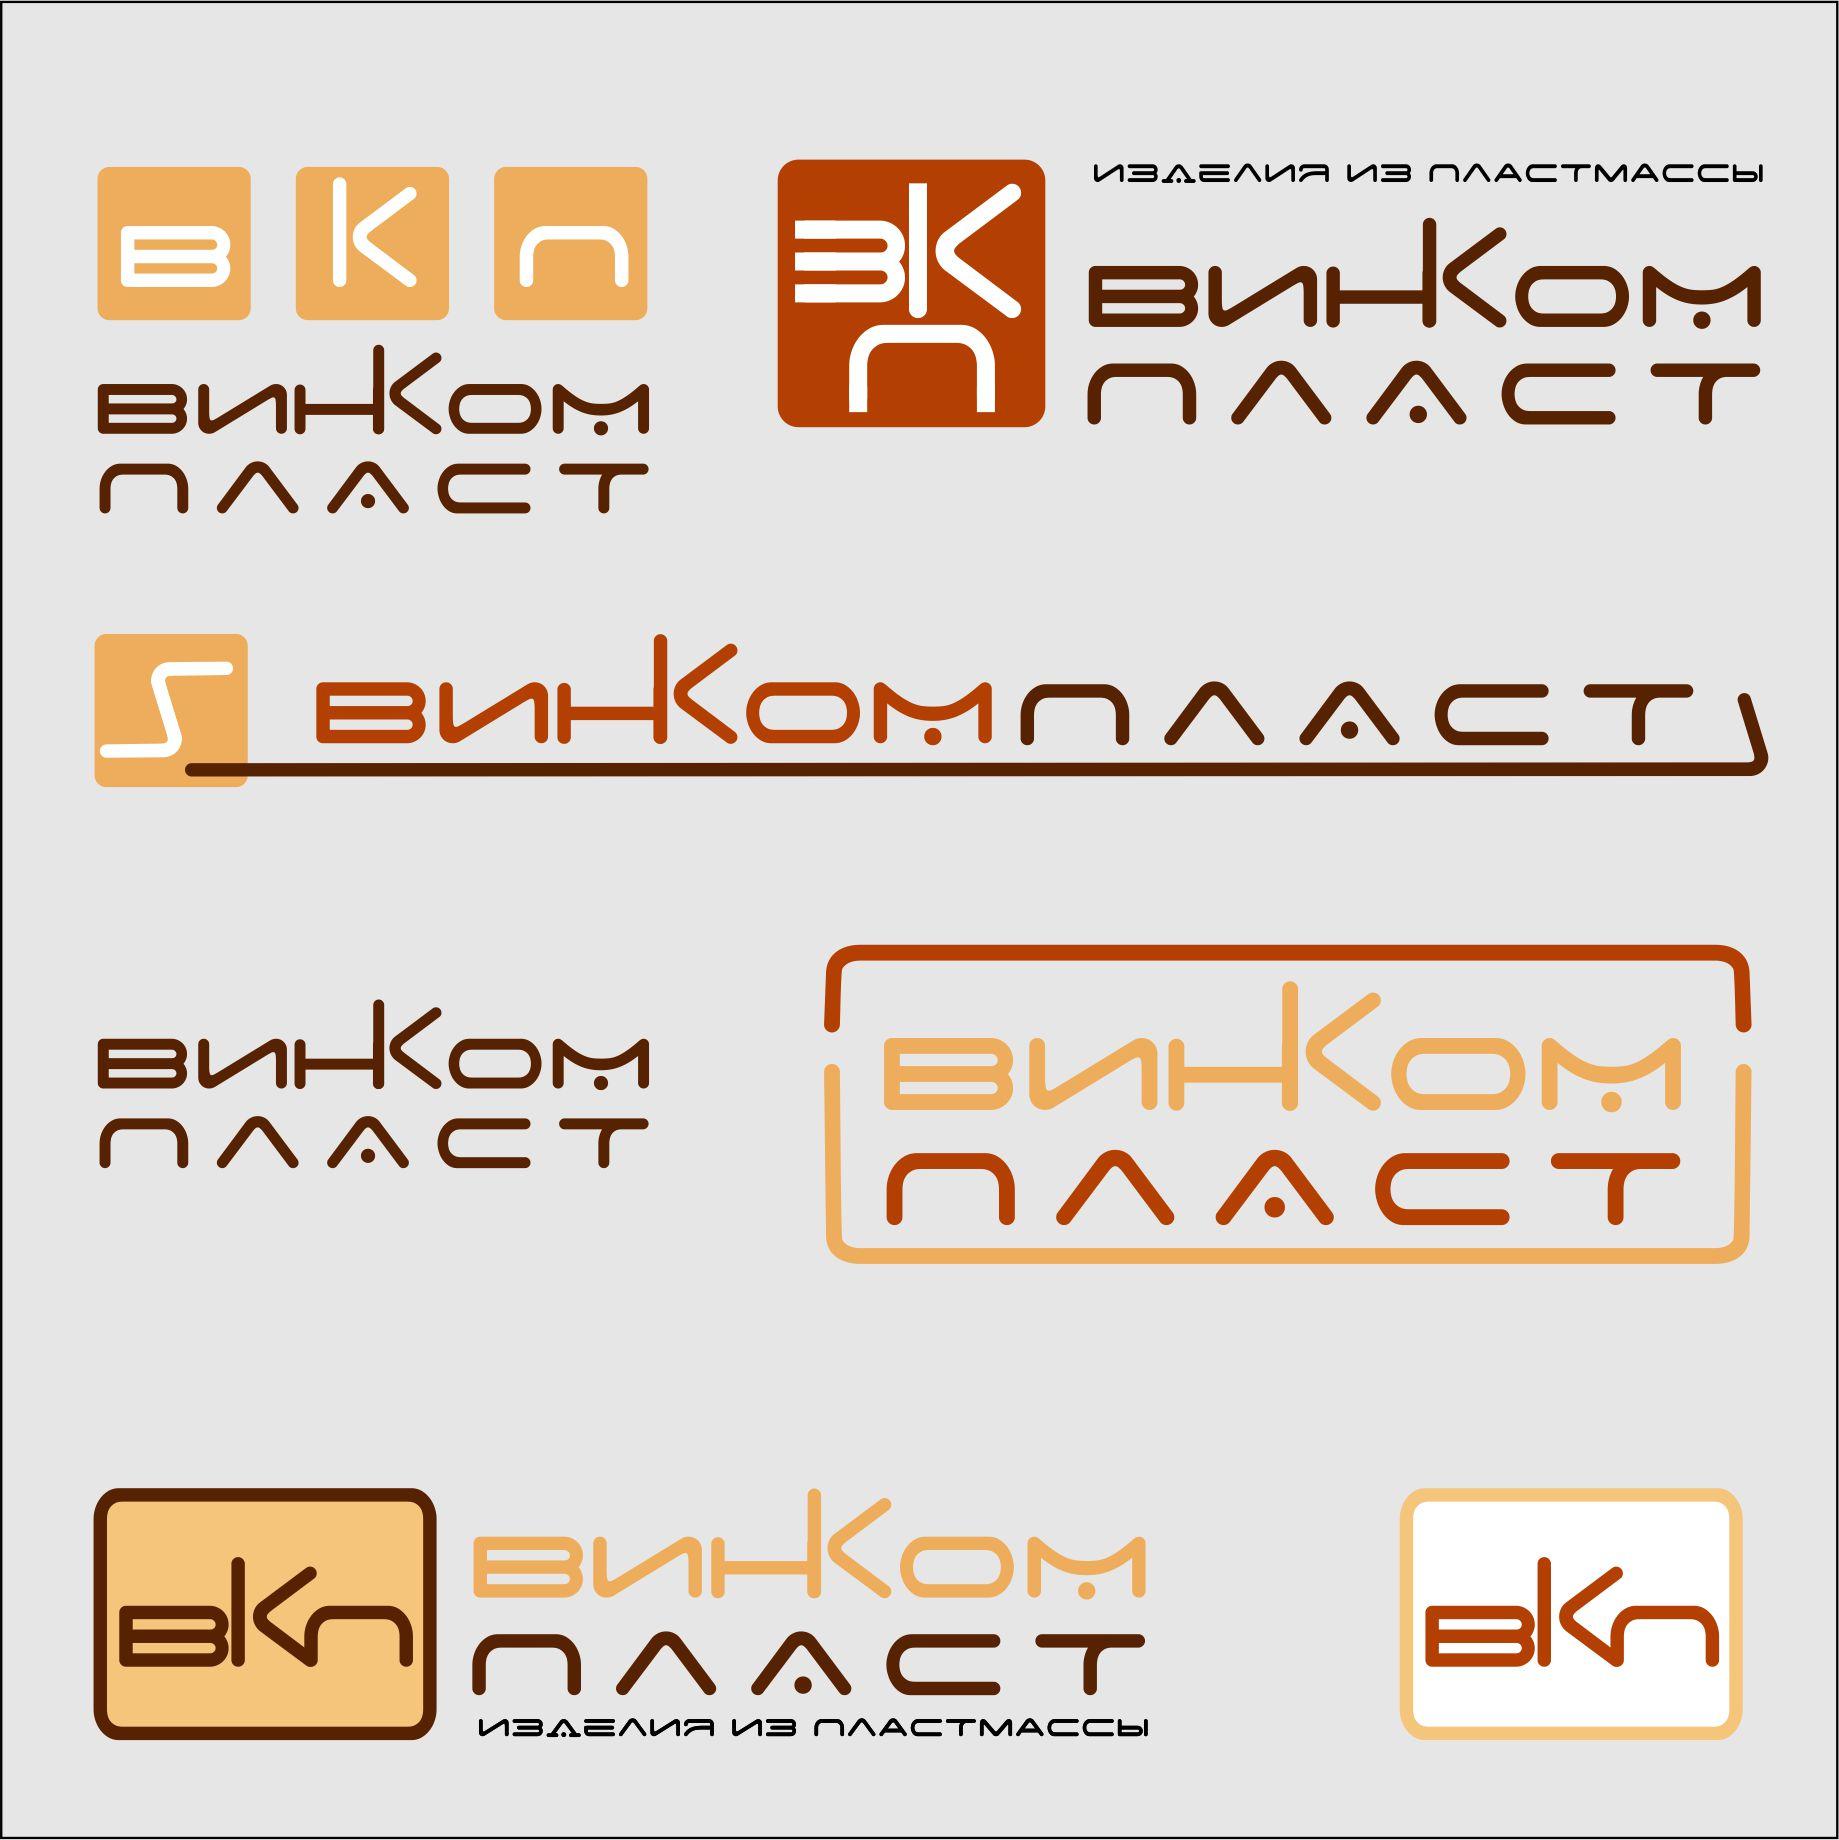 Логотип, фавикон и визитка для компании Винком Пласт  фото f_5285c479b708c66e.jpg